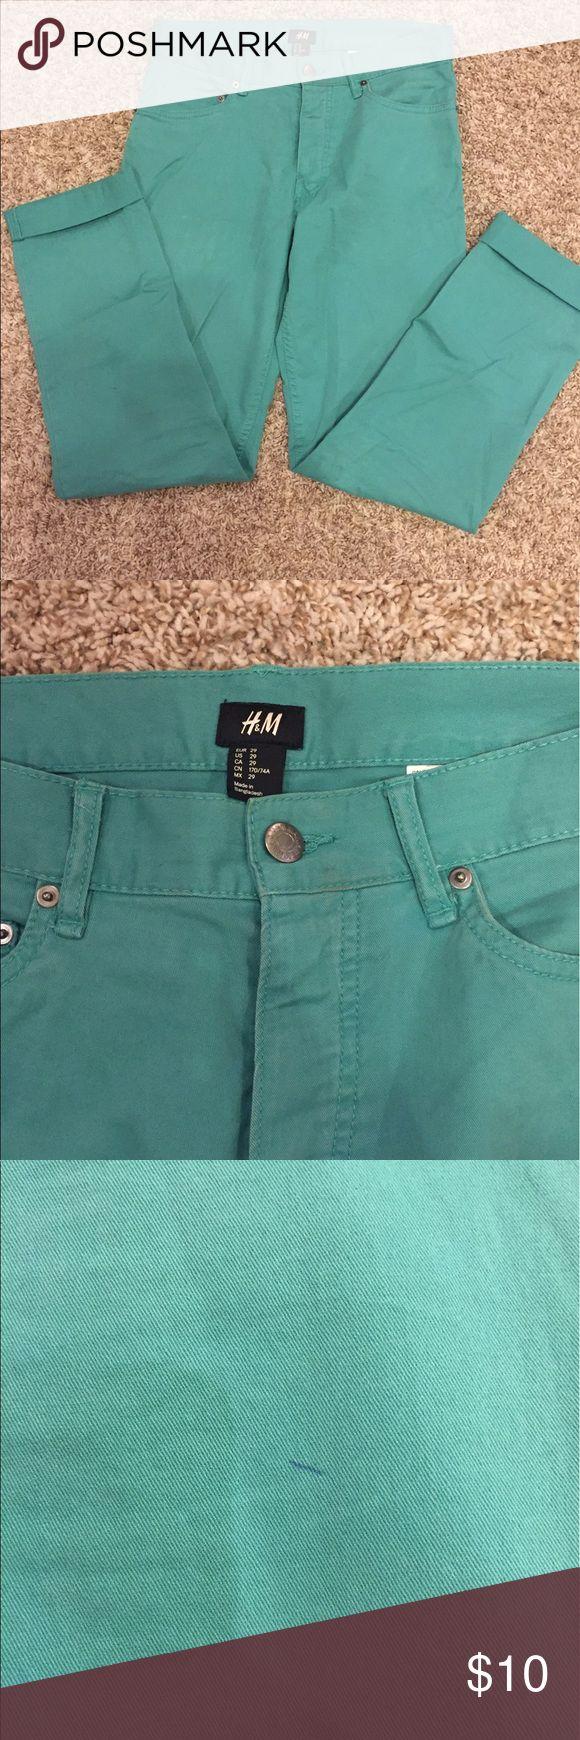 25 Best Ideas About Mens Colored Jeans On Pinterest Jeans Men Fashion Jean Shirt Men And